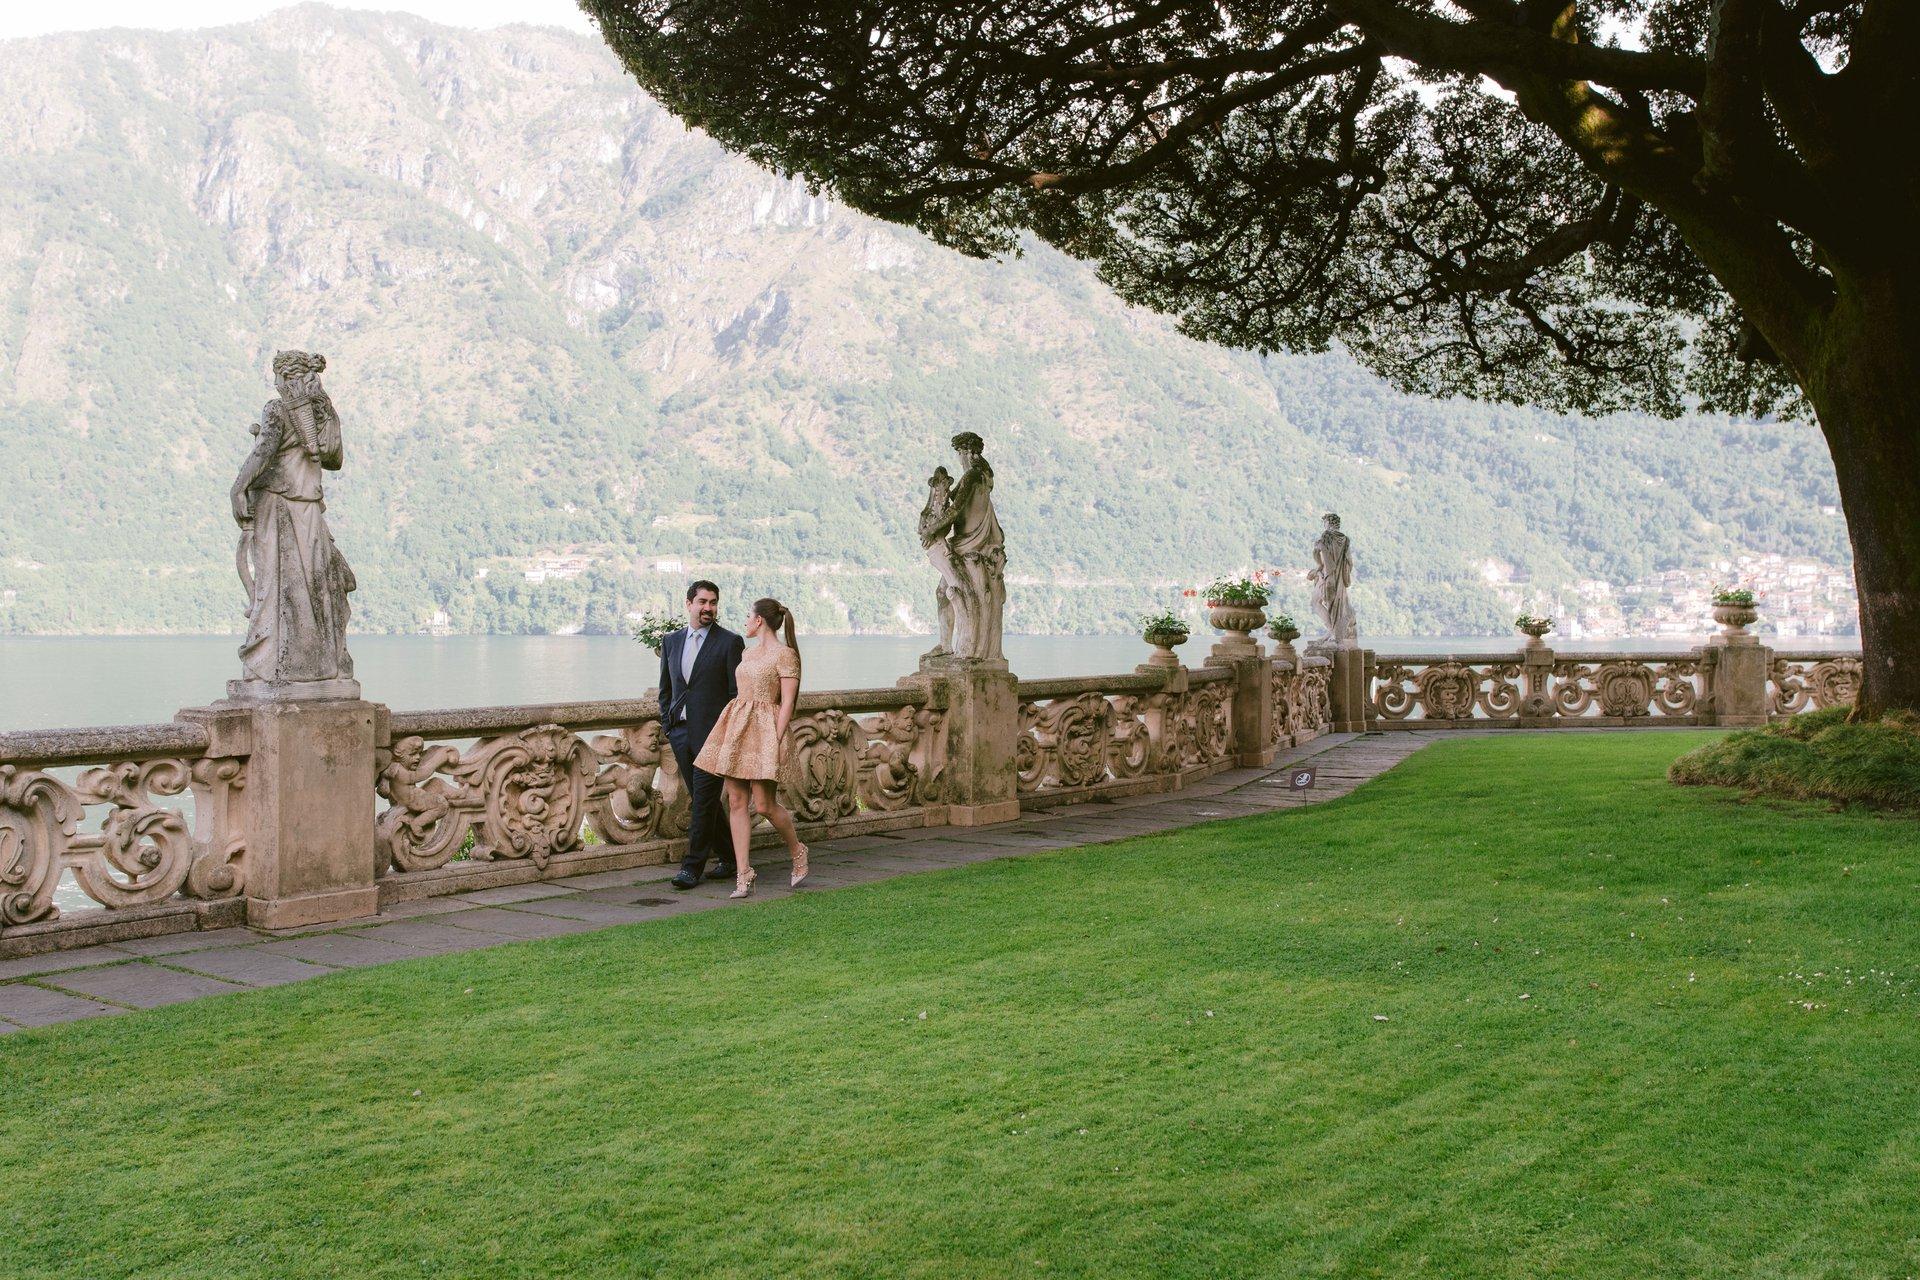 Lake Como-Italy-travel-story-Flytographer-34